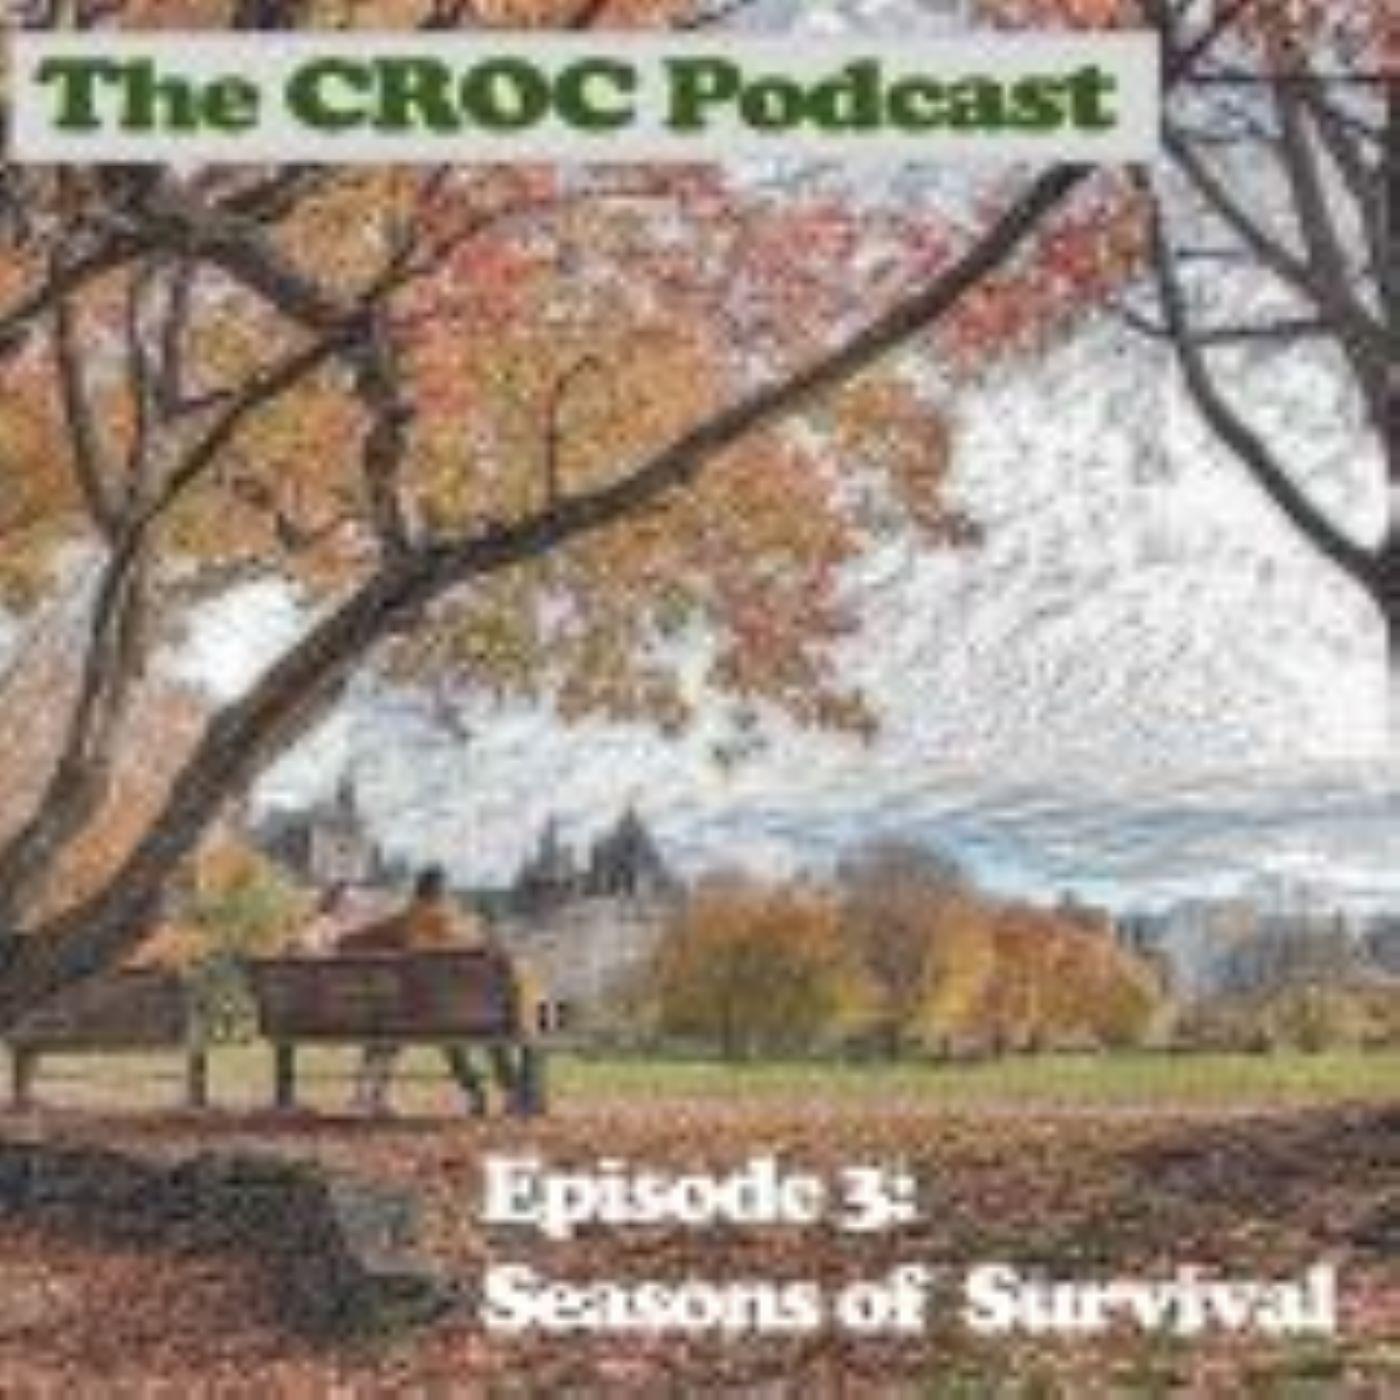 Ep3: Defining Survivorship Module 2 - Seasons of Survivorship